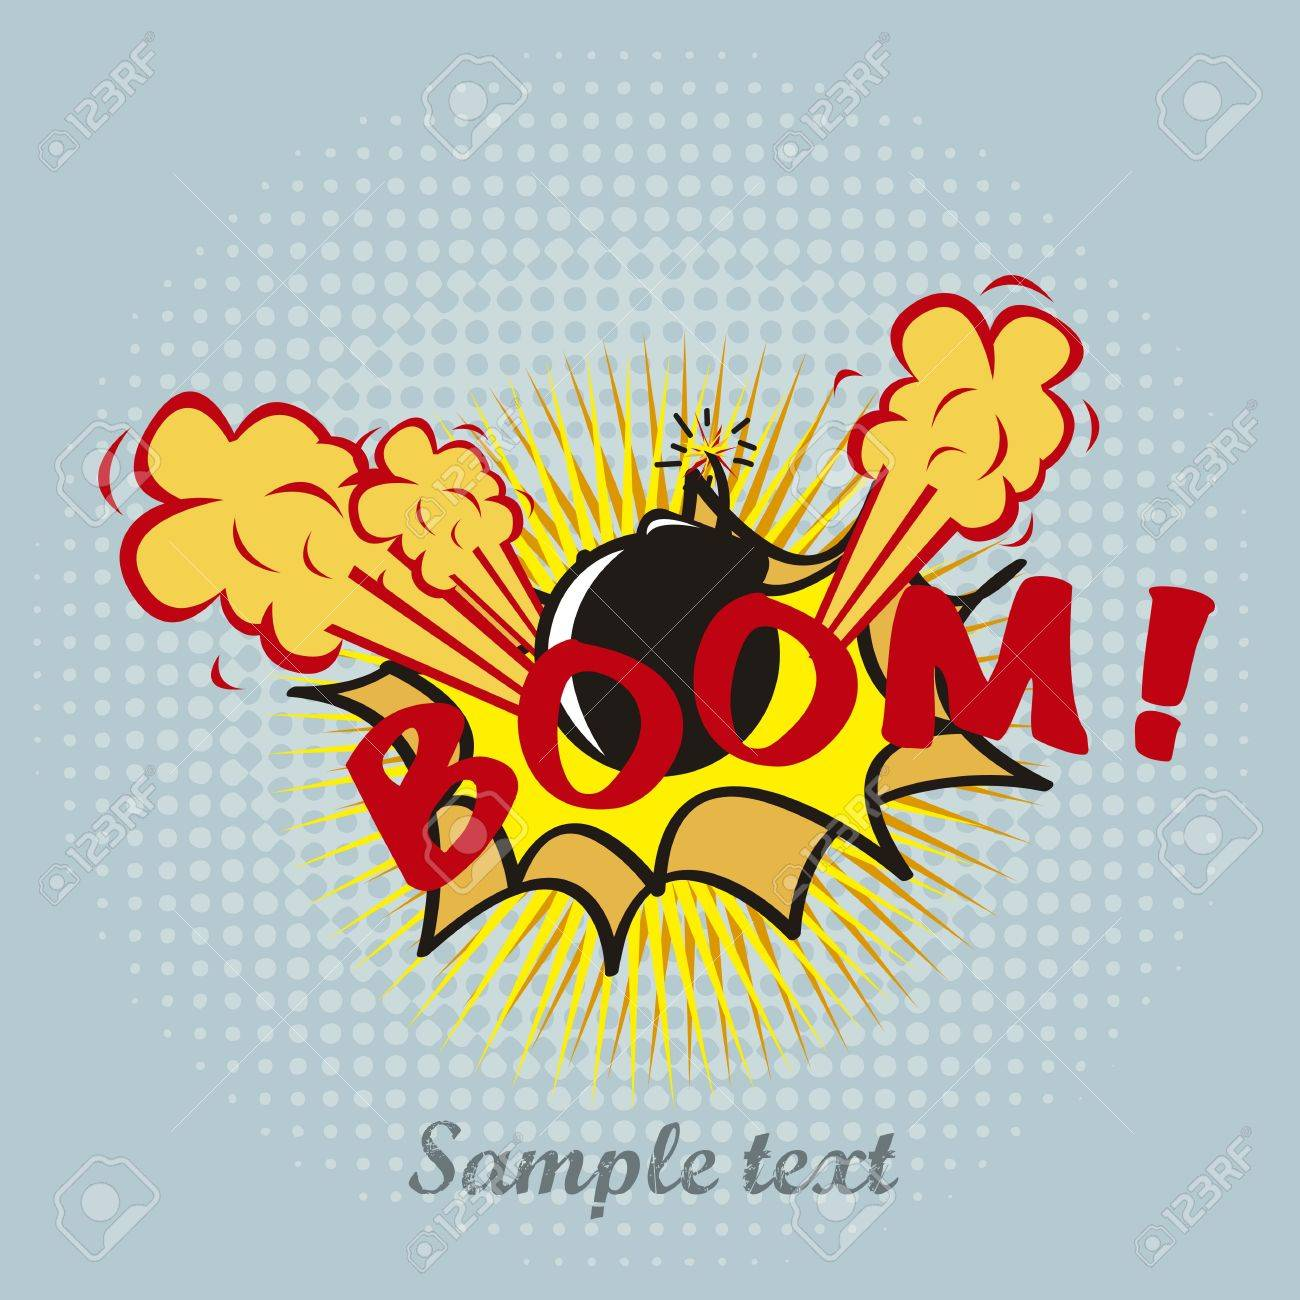 boom pop art over blue background. vector illustration Stock Vector - 16123975